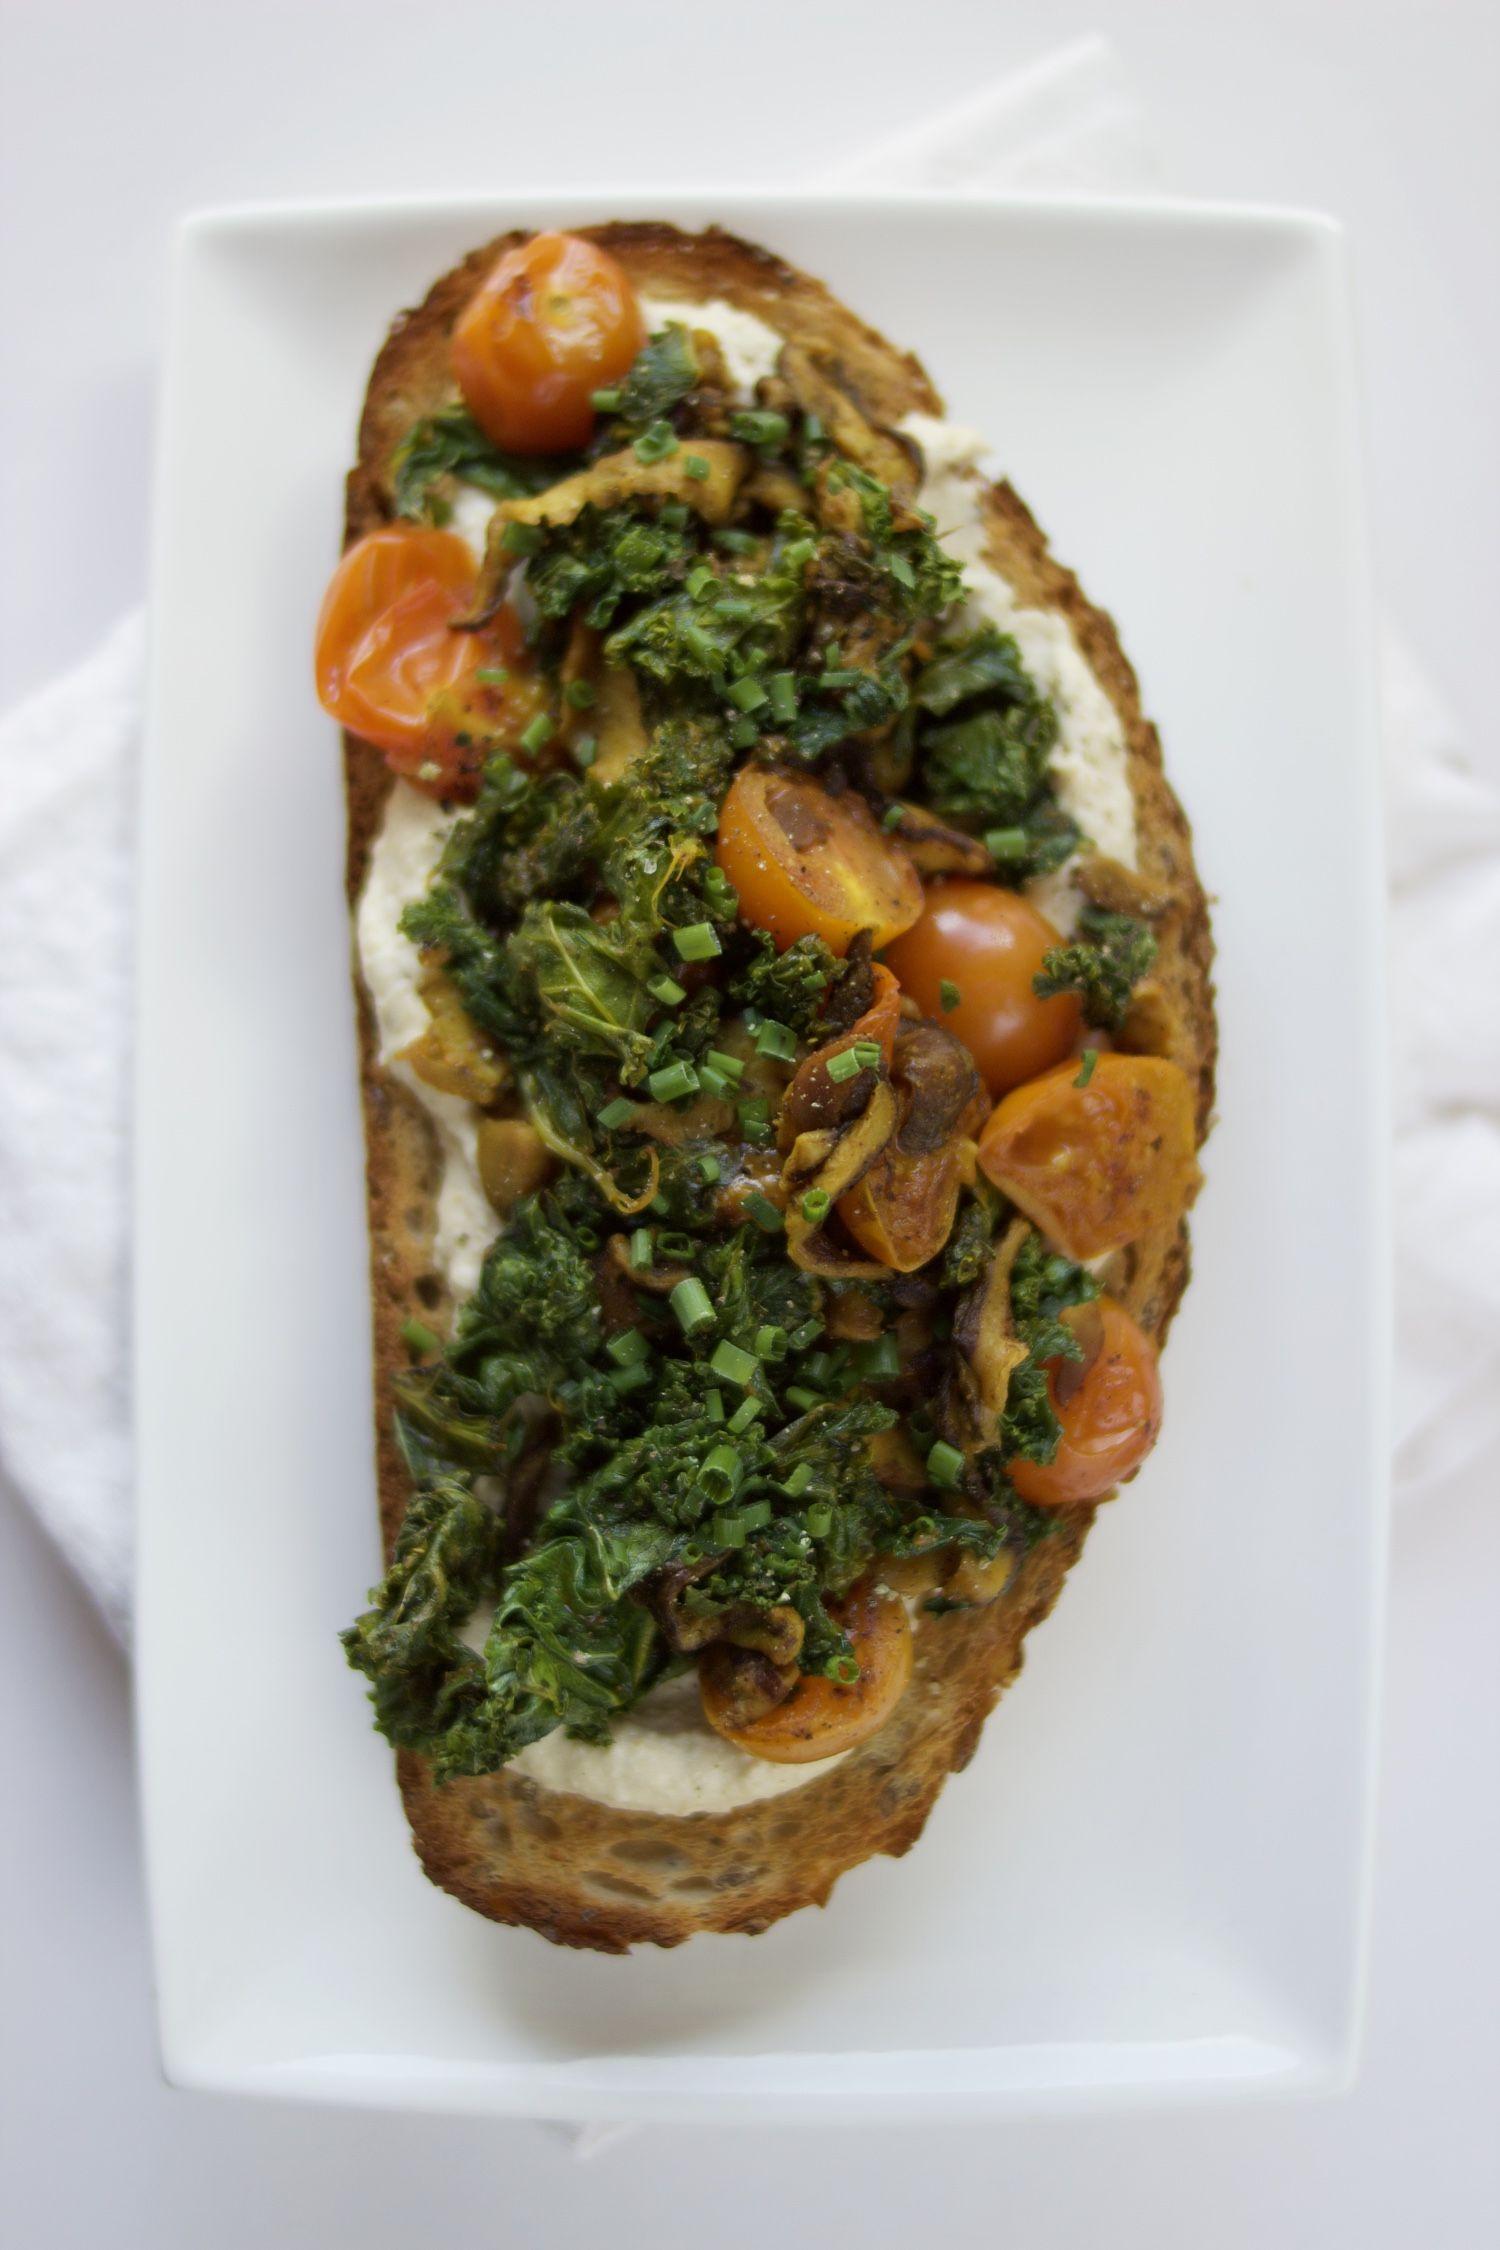 Hummus Kale Shiitake And Turmeric Toast Spice Garden